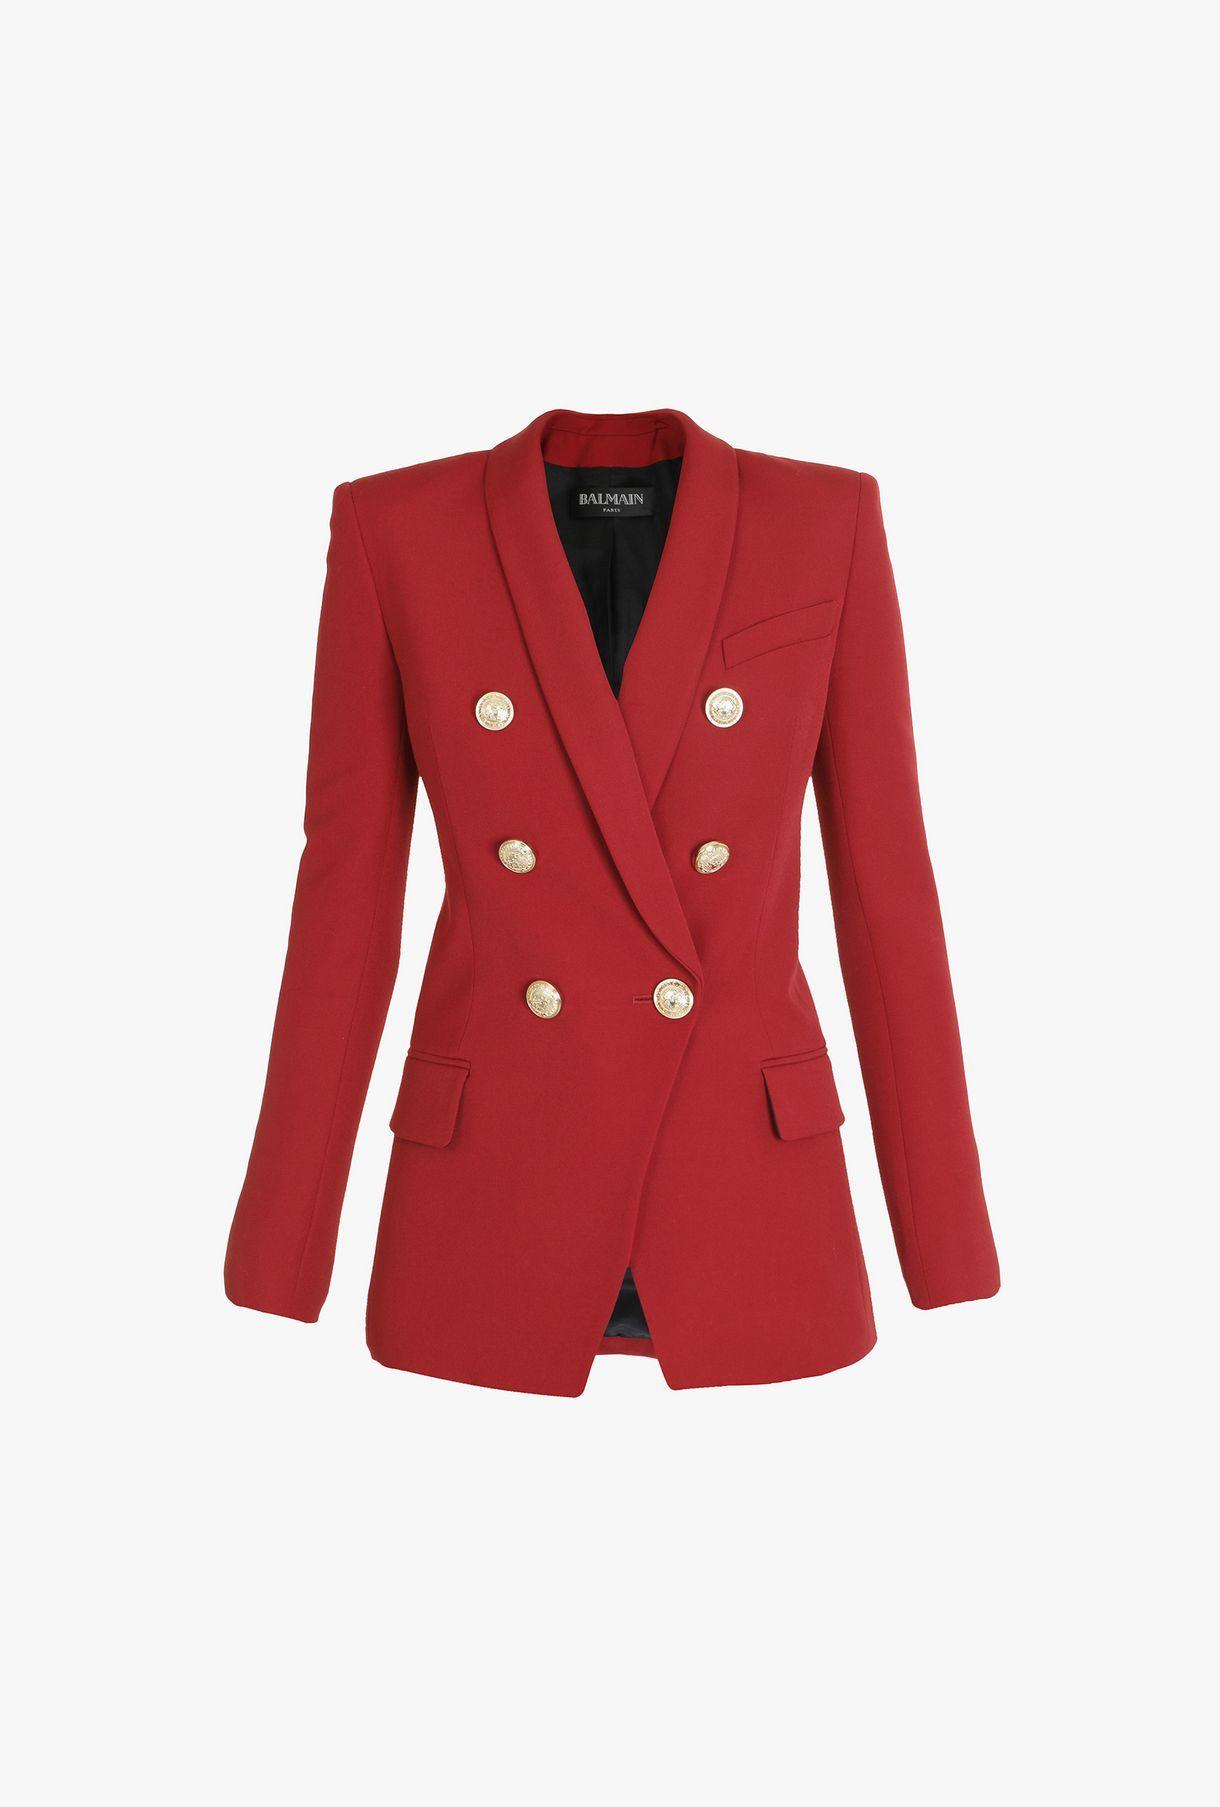 ab89b90c5d3cb BALMAIN Oversized double-breasted wool blazer Jacket Woman f ...